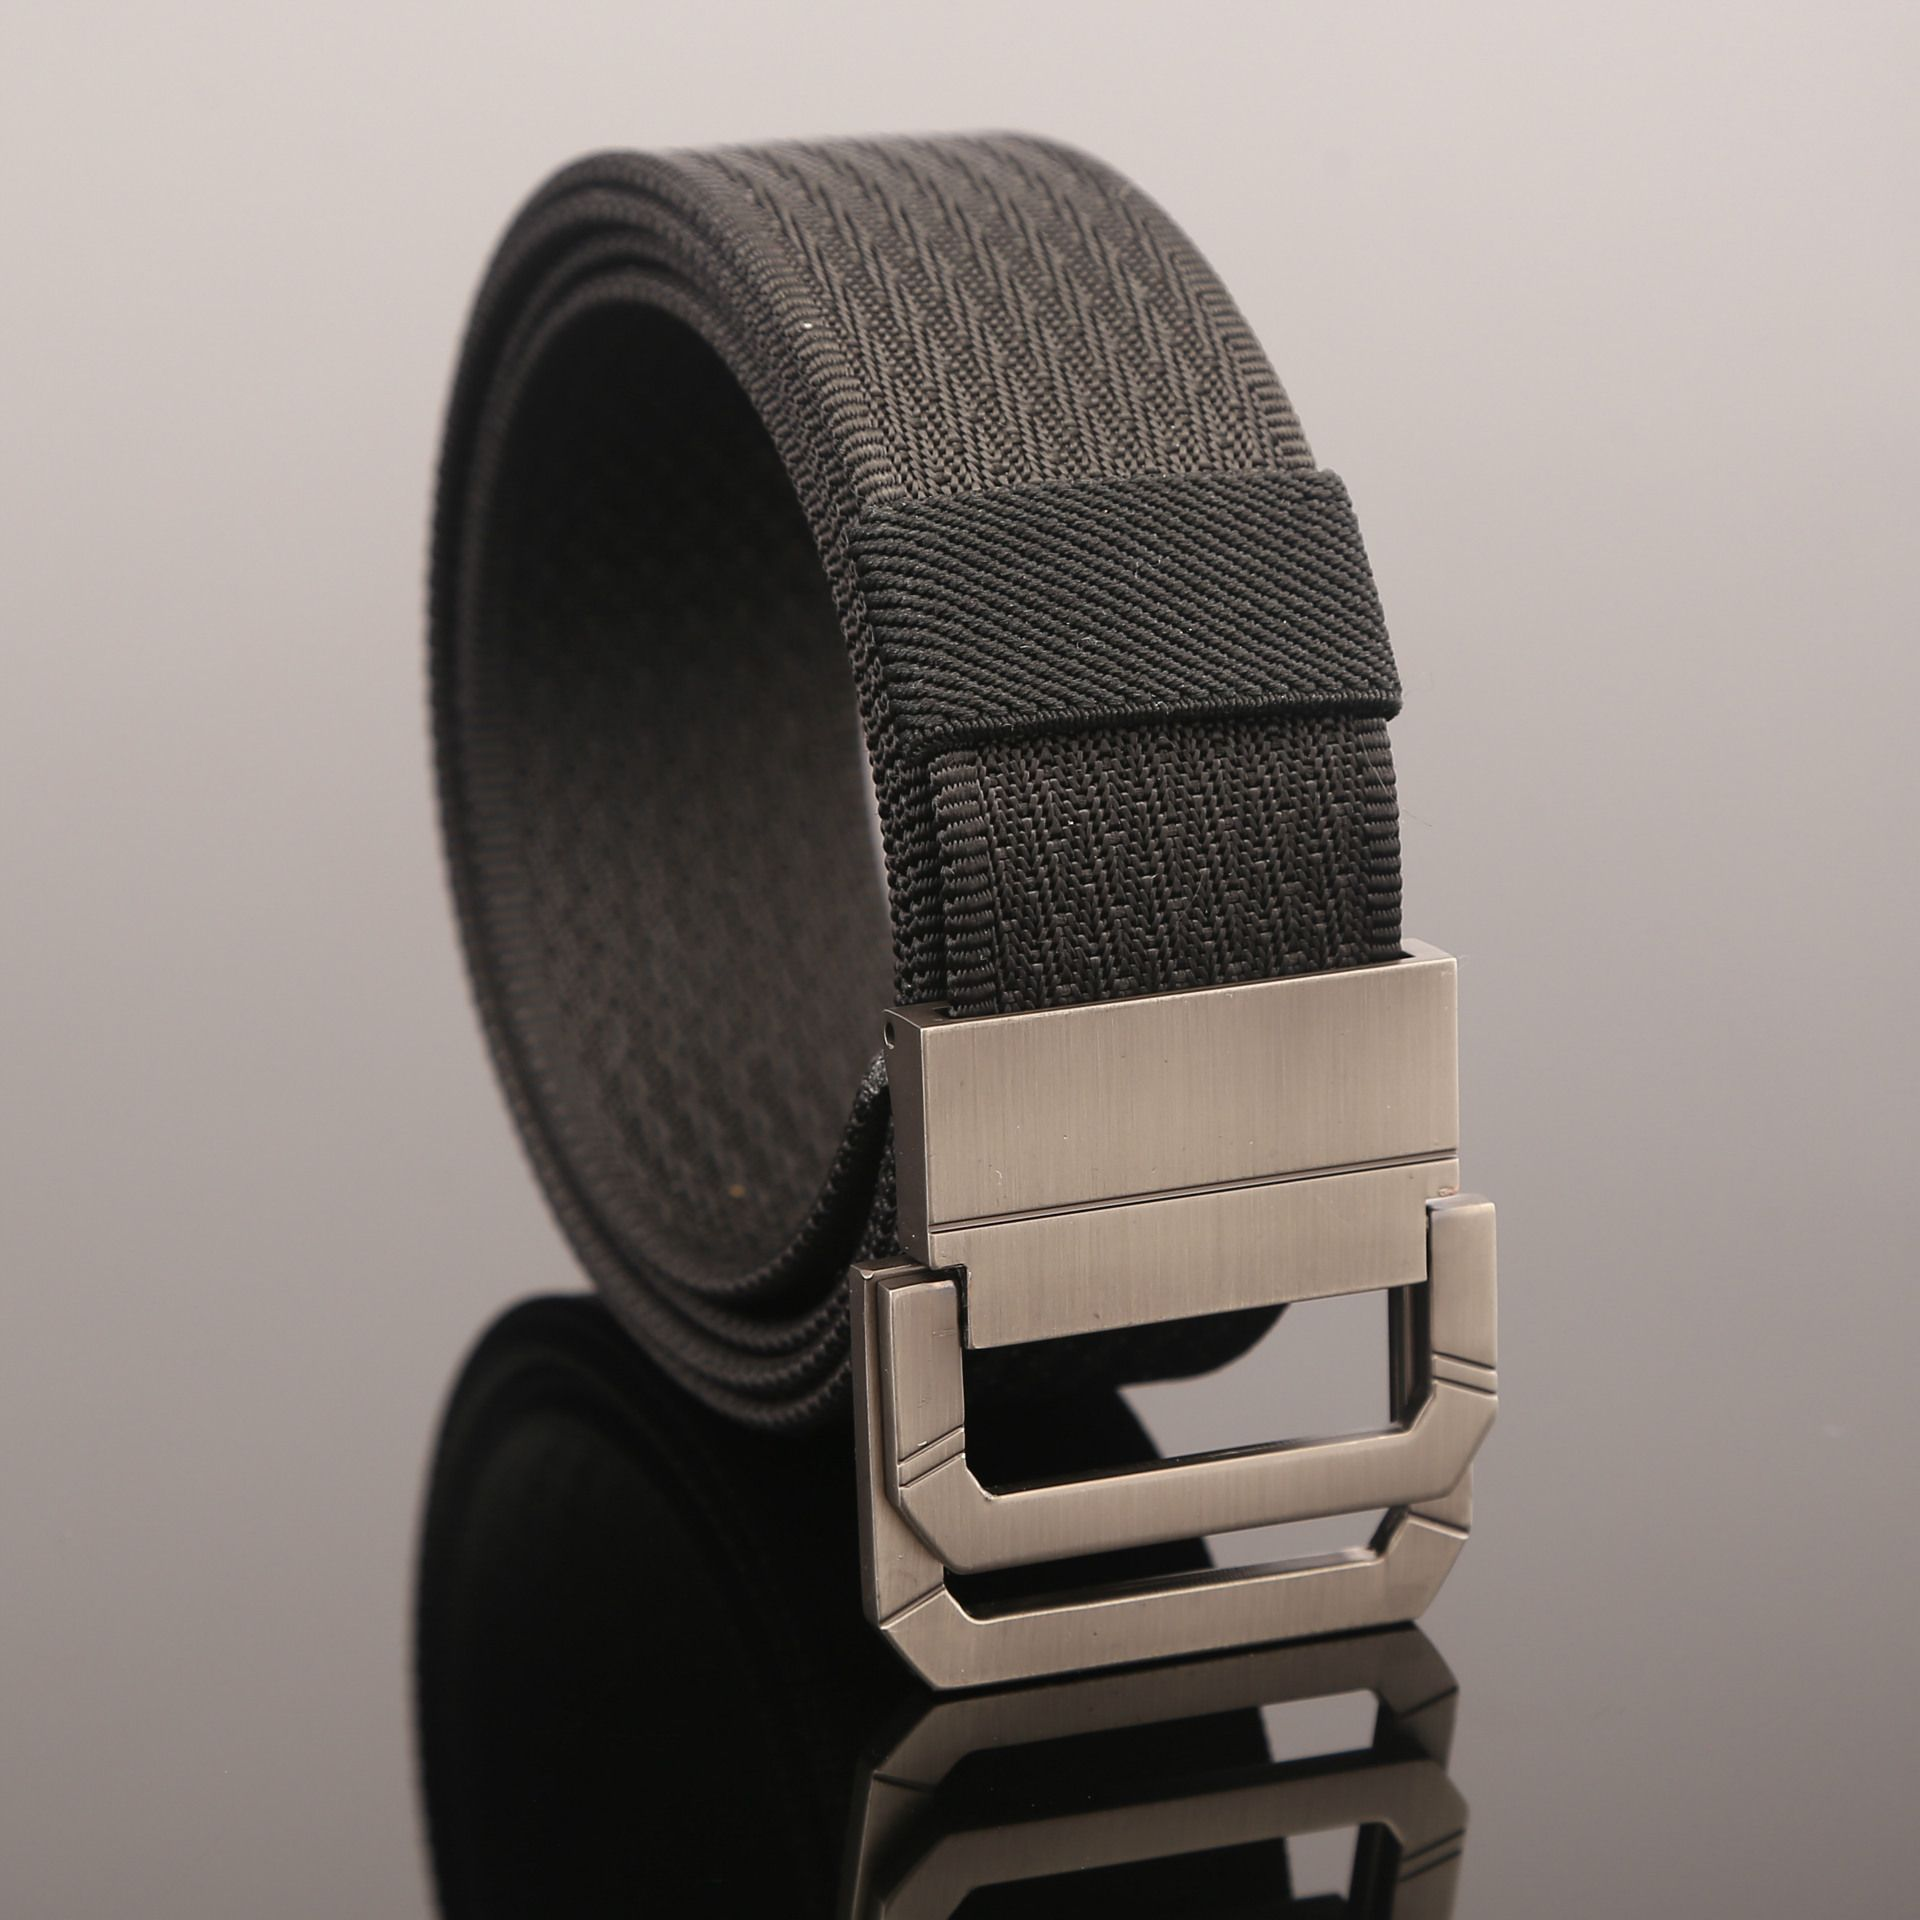 Blackhawk Double Ring Buckle Mens Nylon Canvas Belt for Men